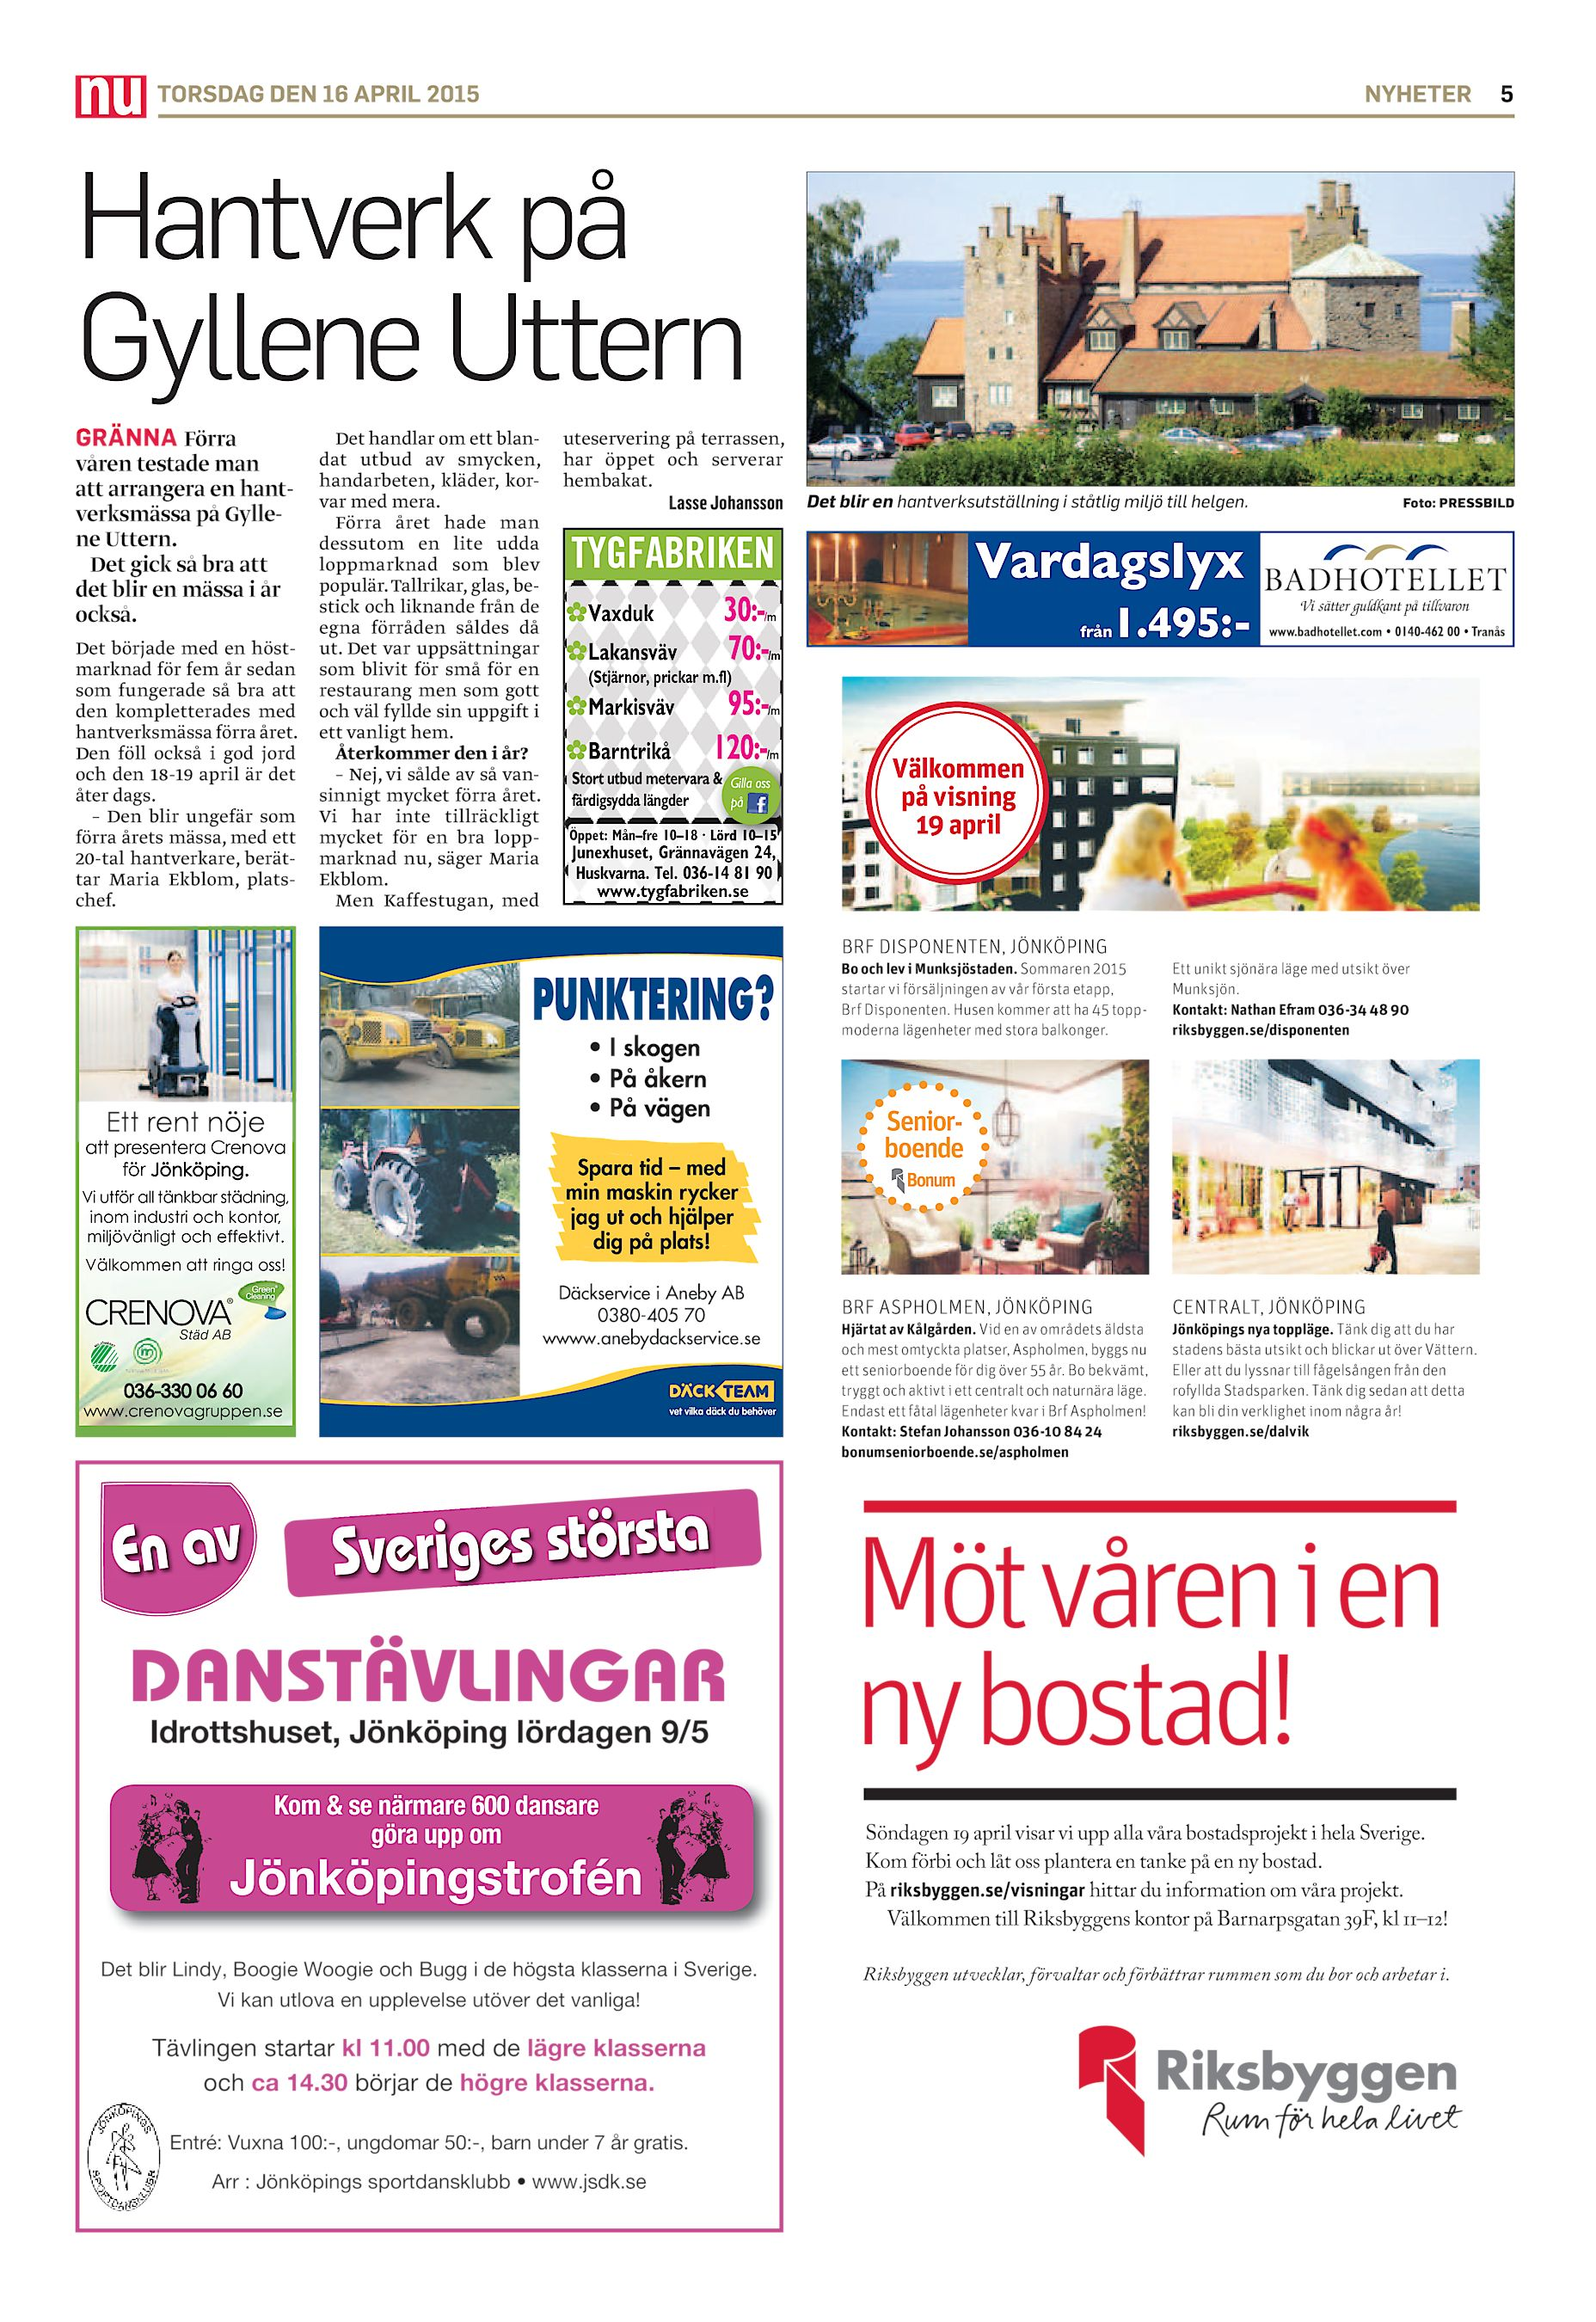 Jönköping.nu JNU-20150416 (endast text) 0083e025f88c8